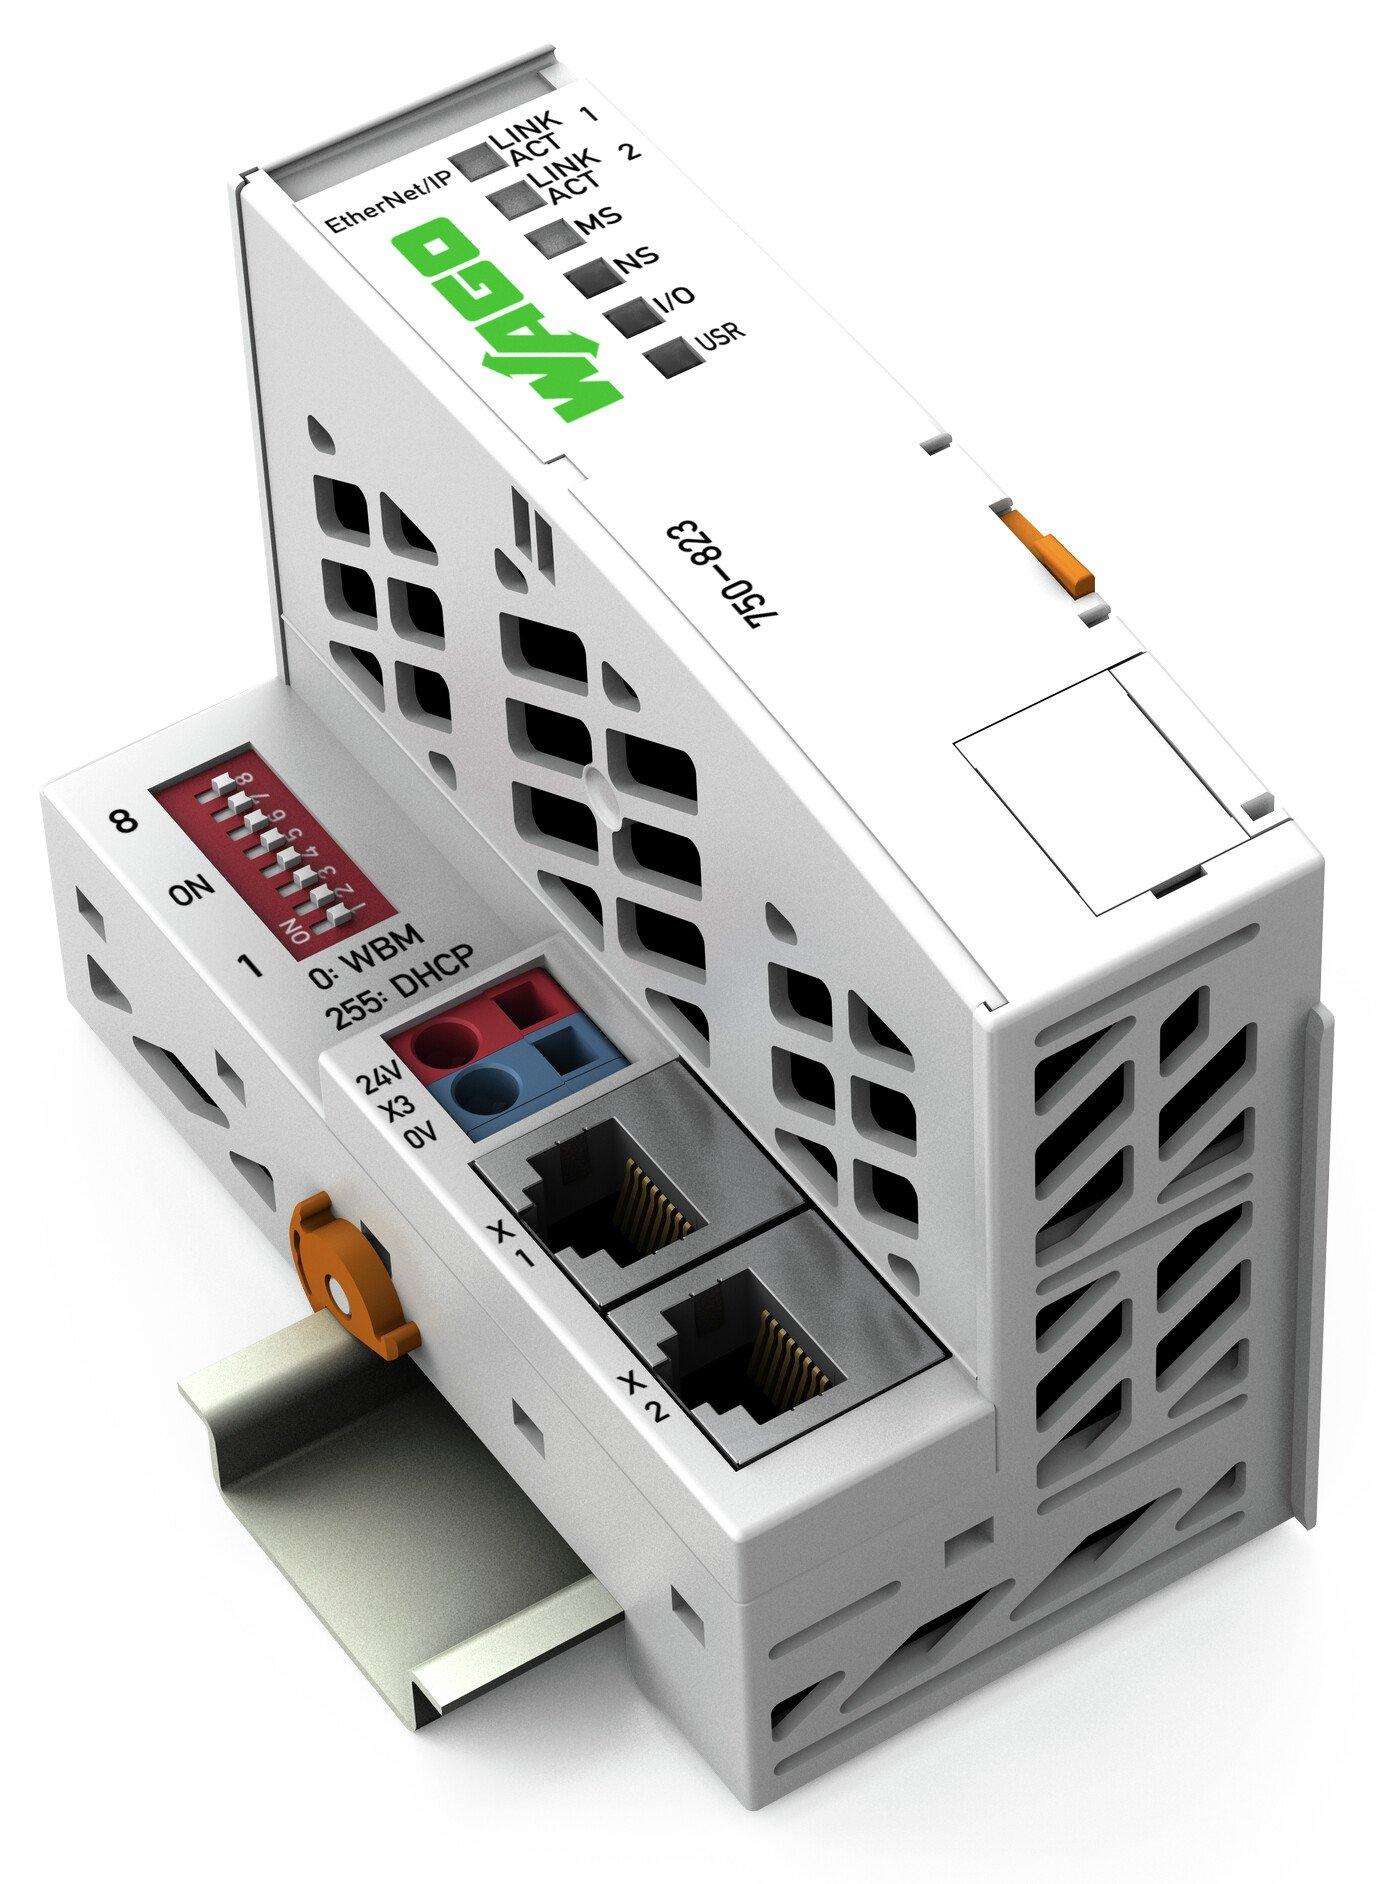 WAGO Controller EtherNet/IP 4. Gen. 2x ETHERNET ECO